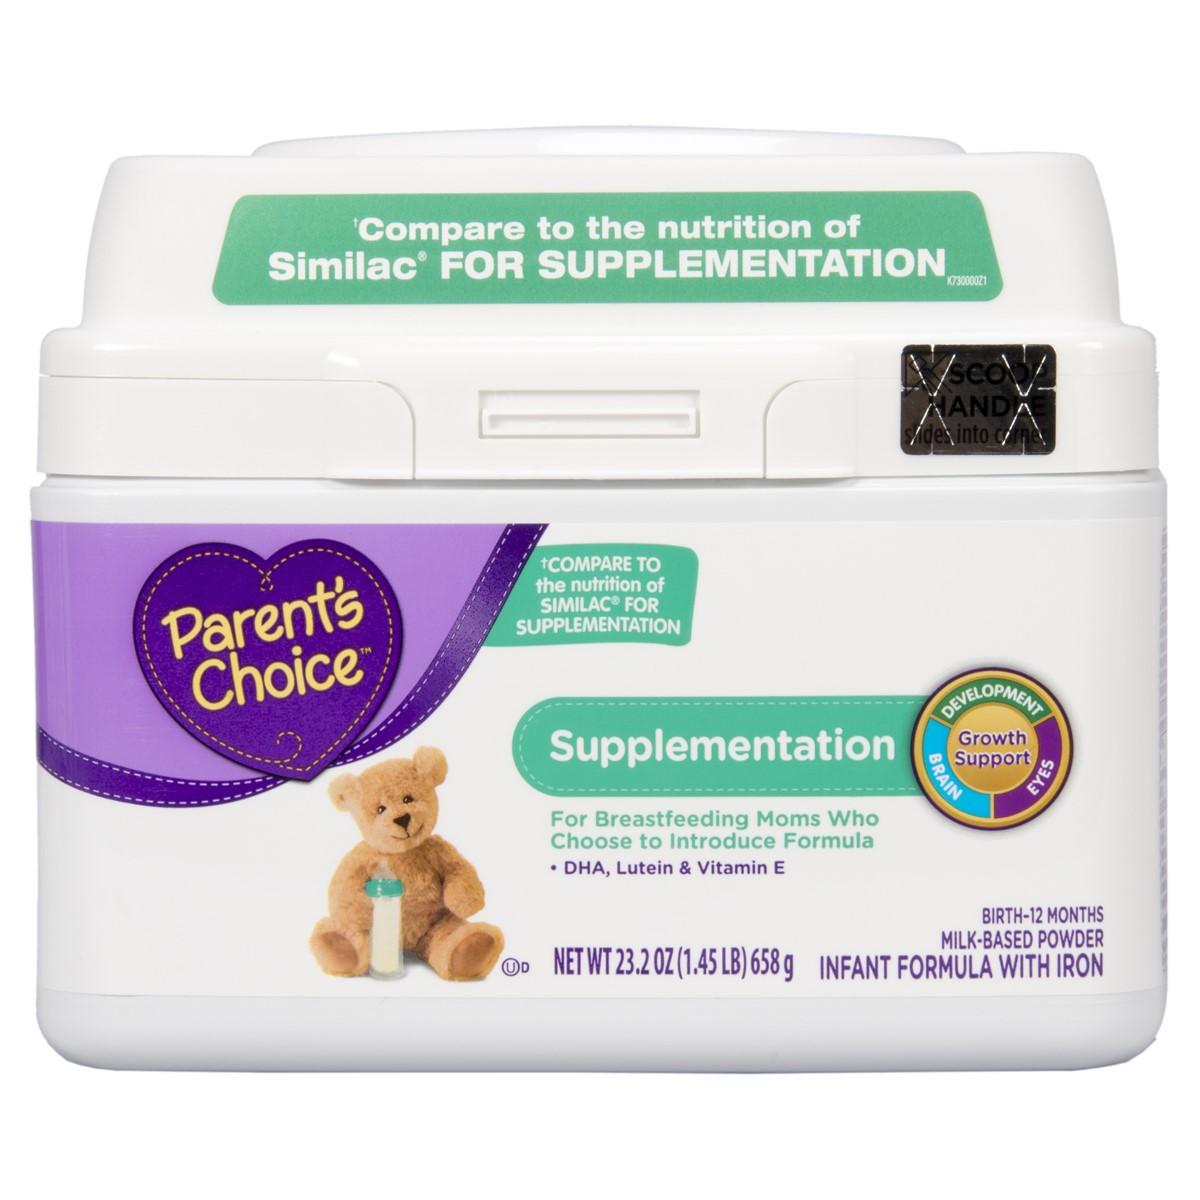 Parent's Choice Supplementation Infant Formula with iron, 23 oz